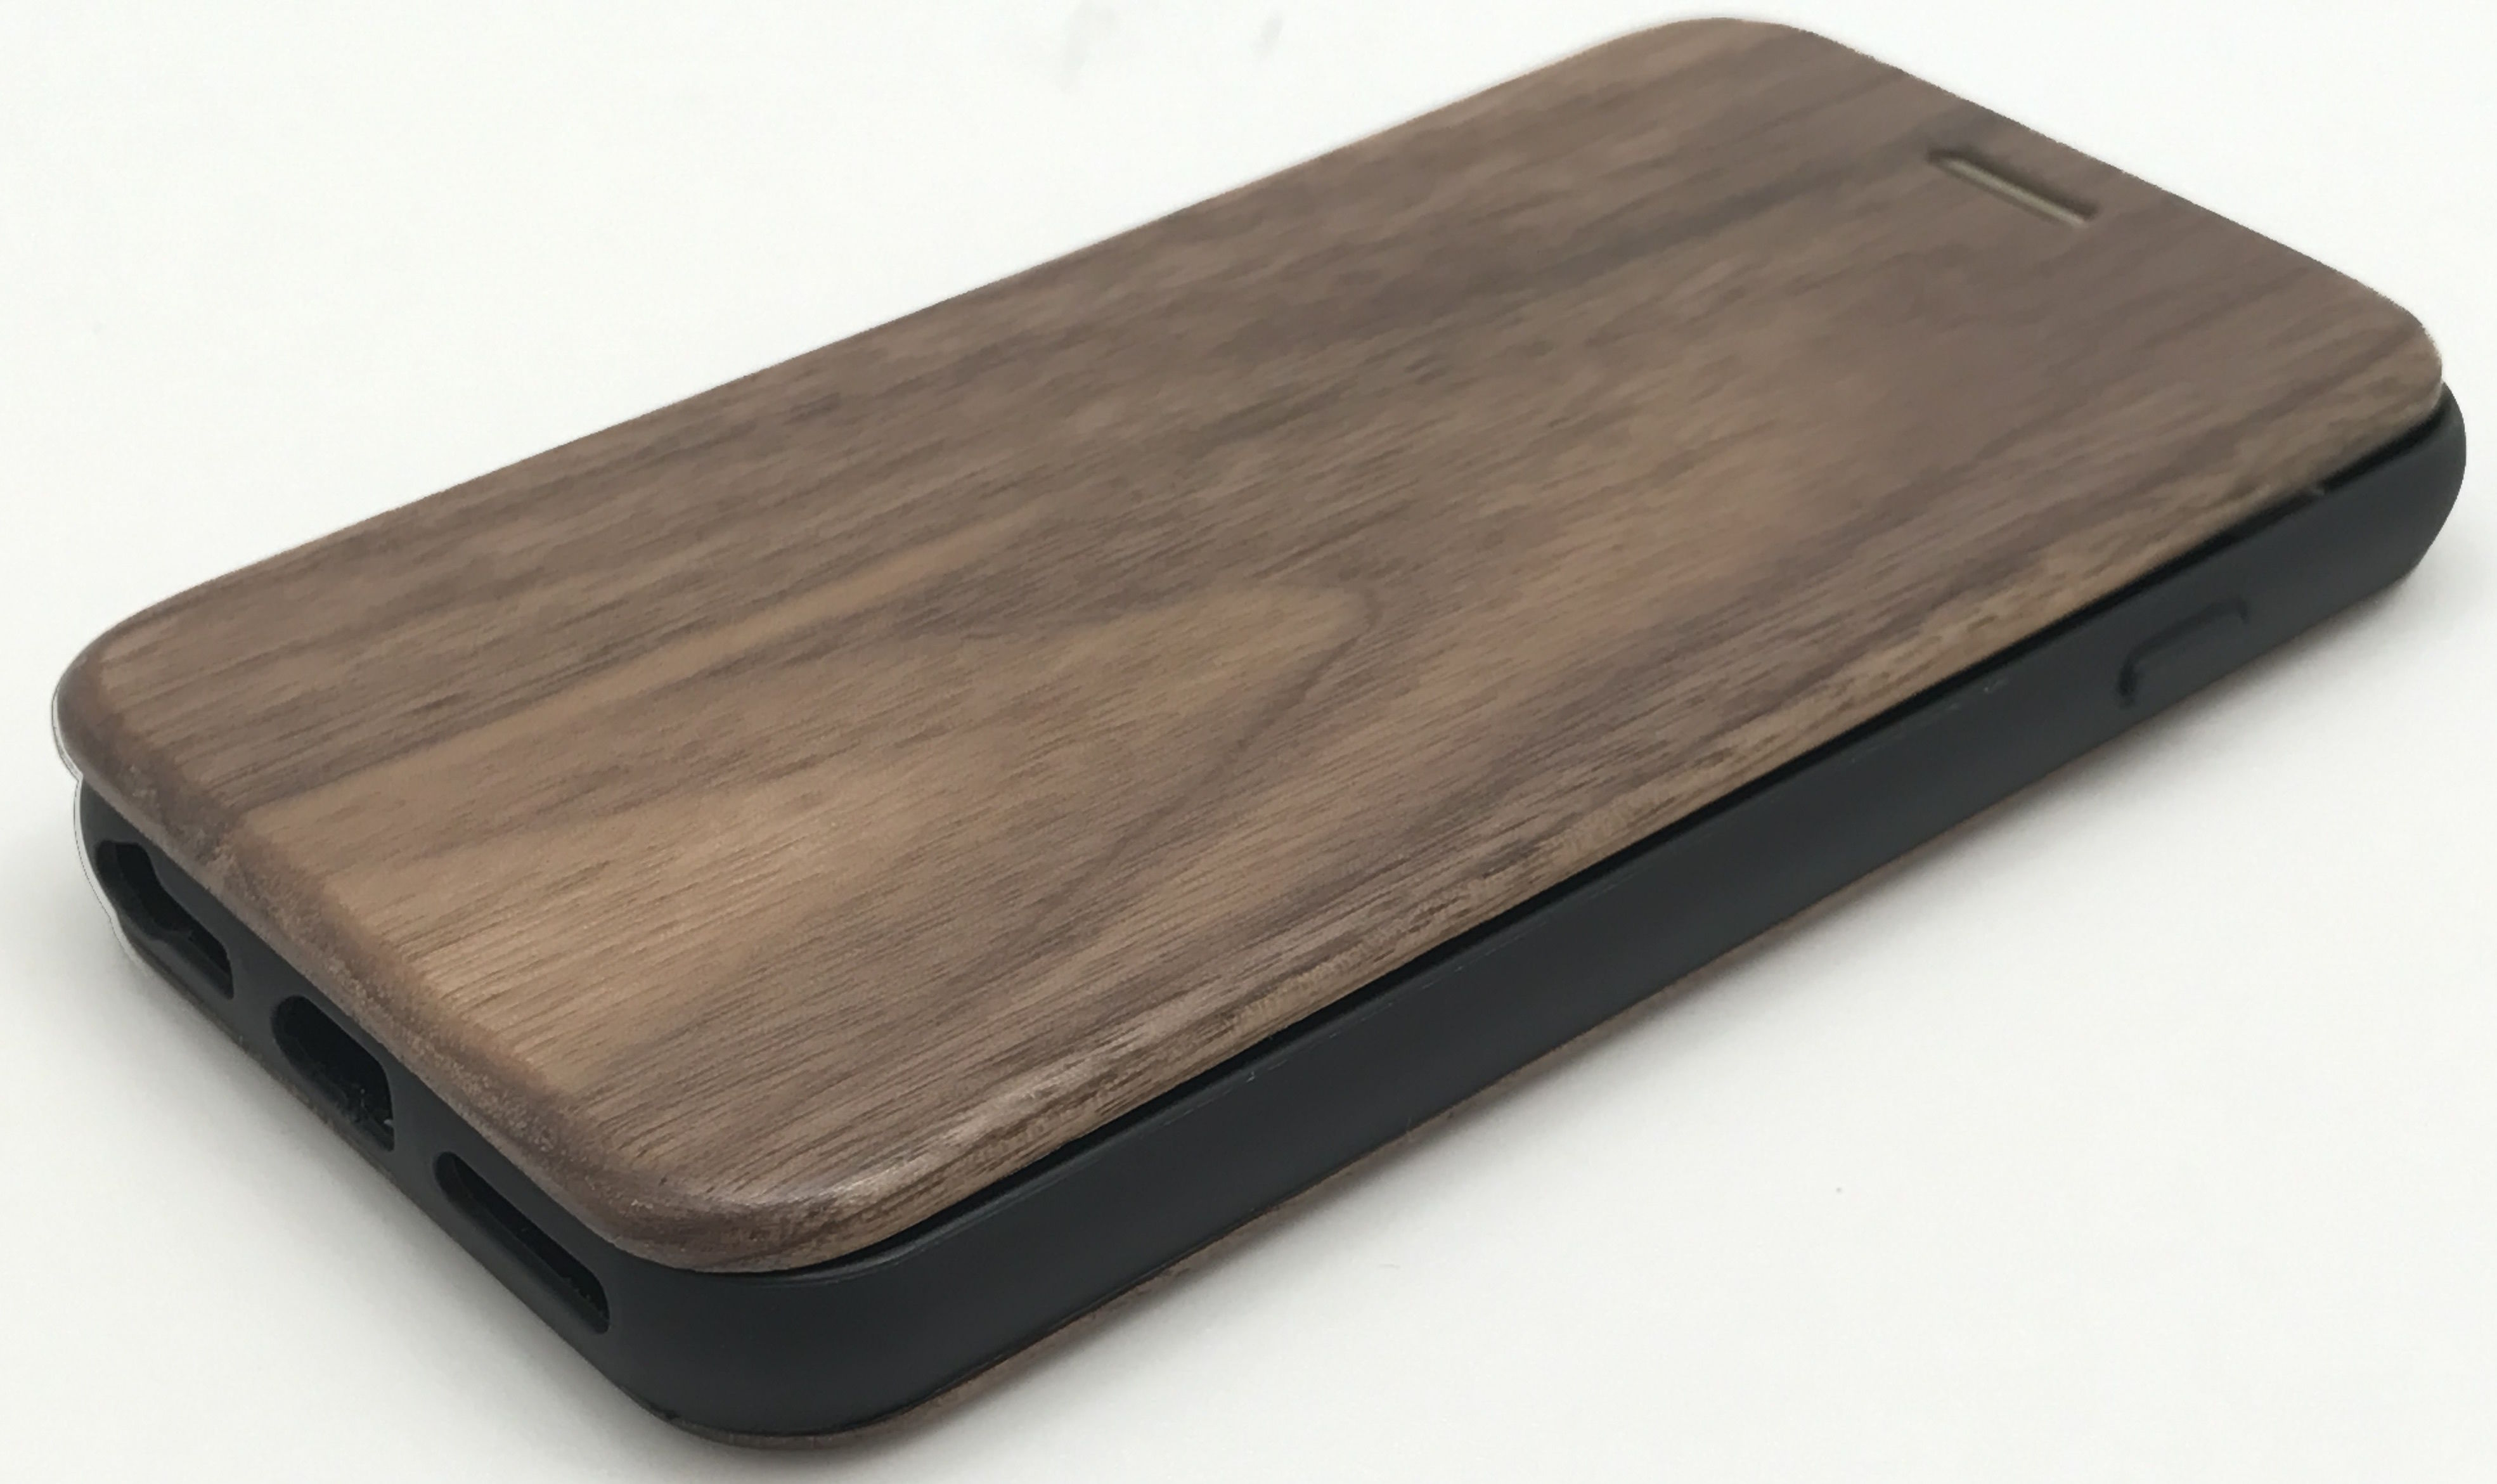 Walnut Flip Case for iPhone 7